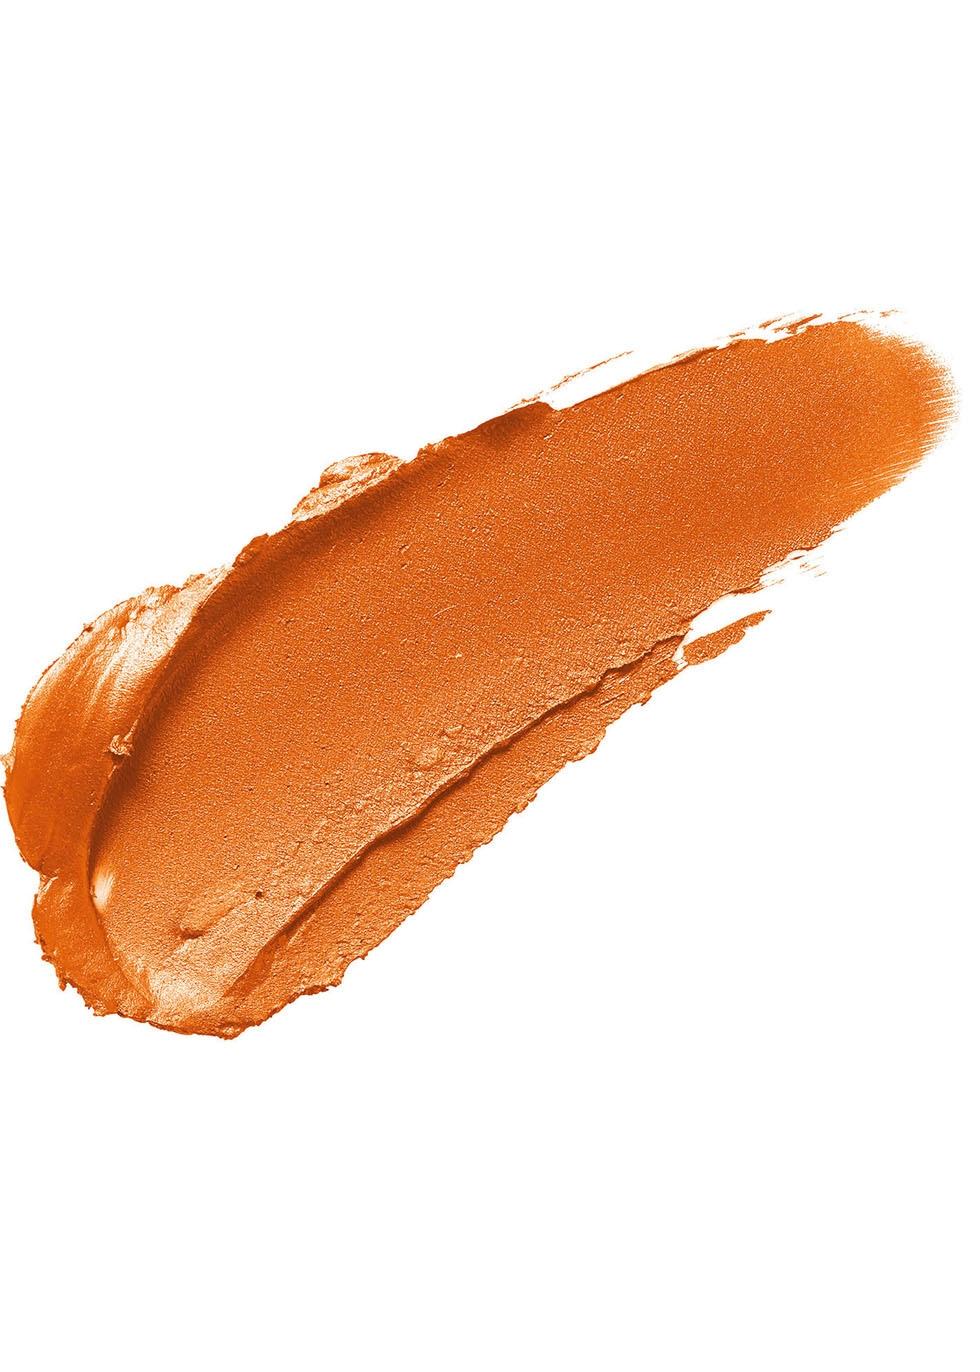 Mattemoiselle Plush Matte Lipstick Saw-C - FENTY BEAUTY